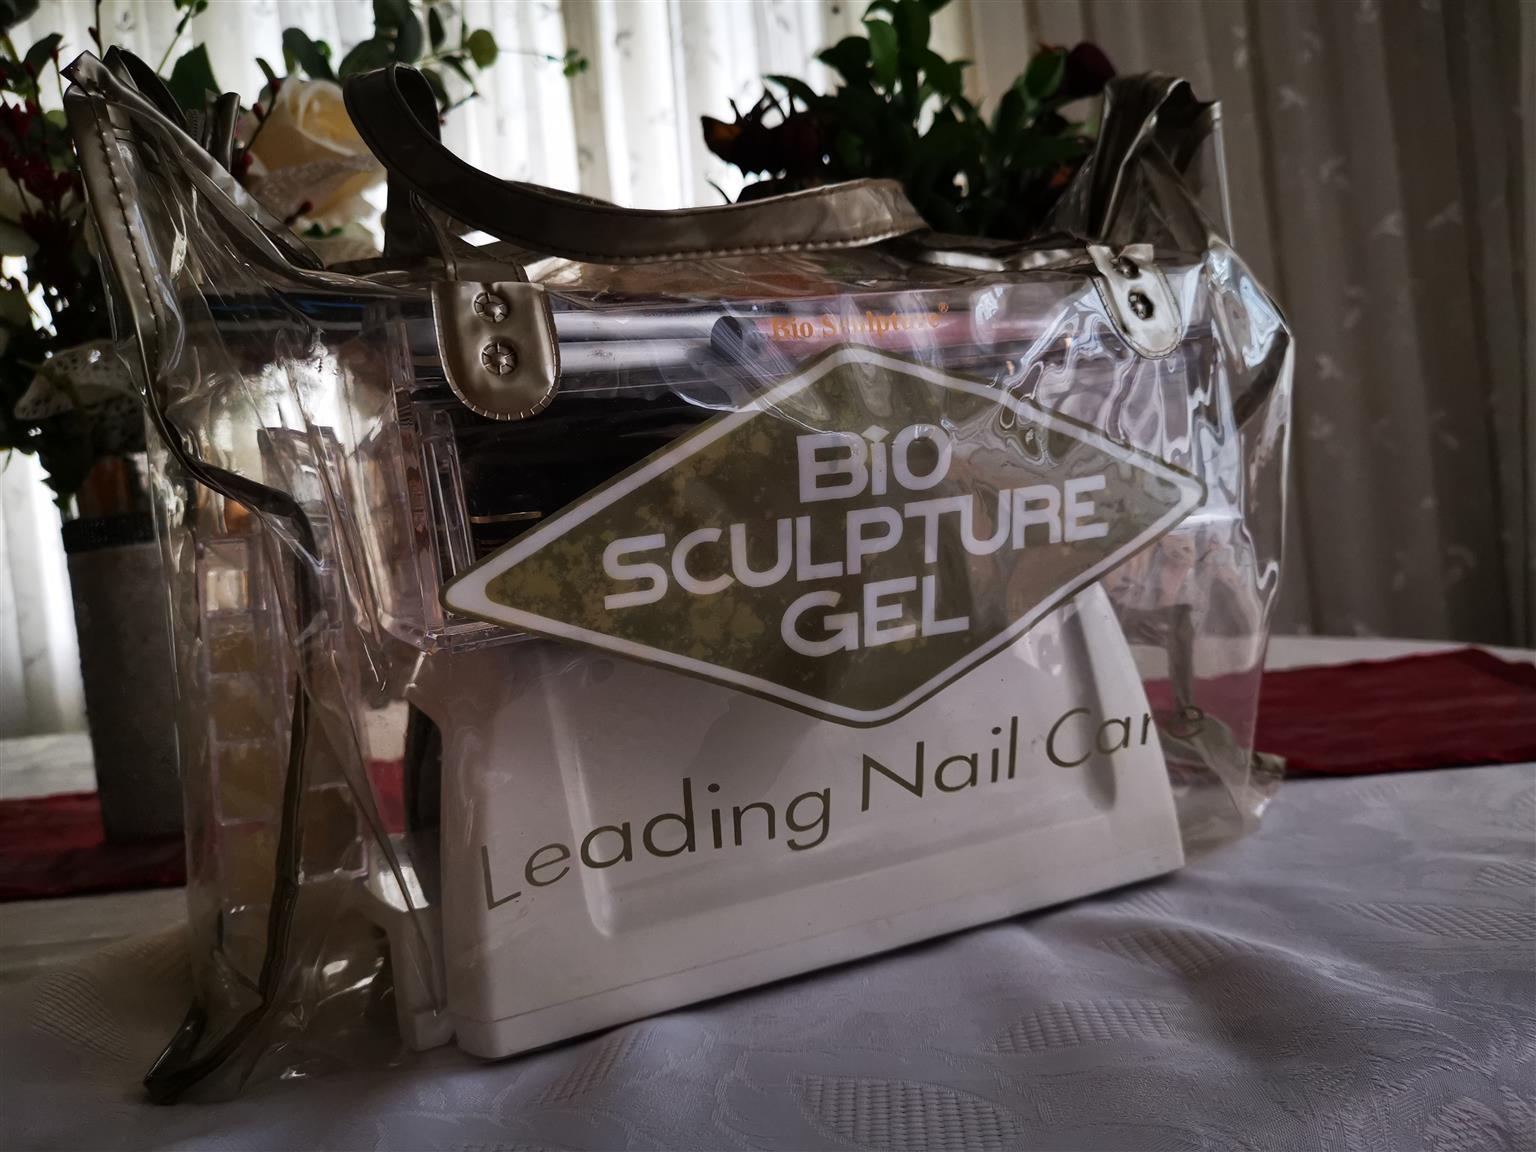 Bio sculpture Nail kit